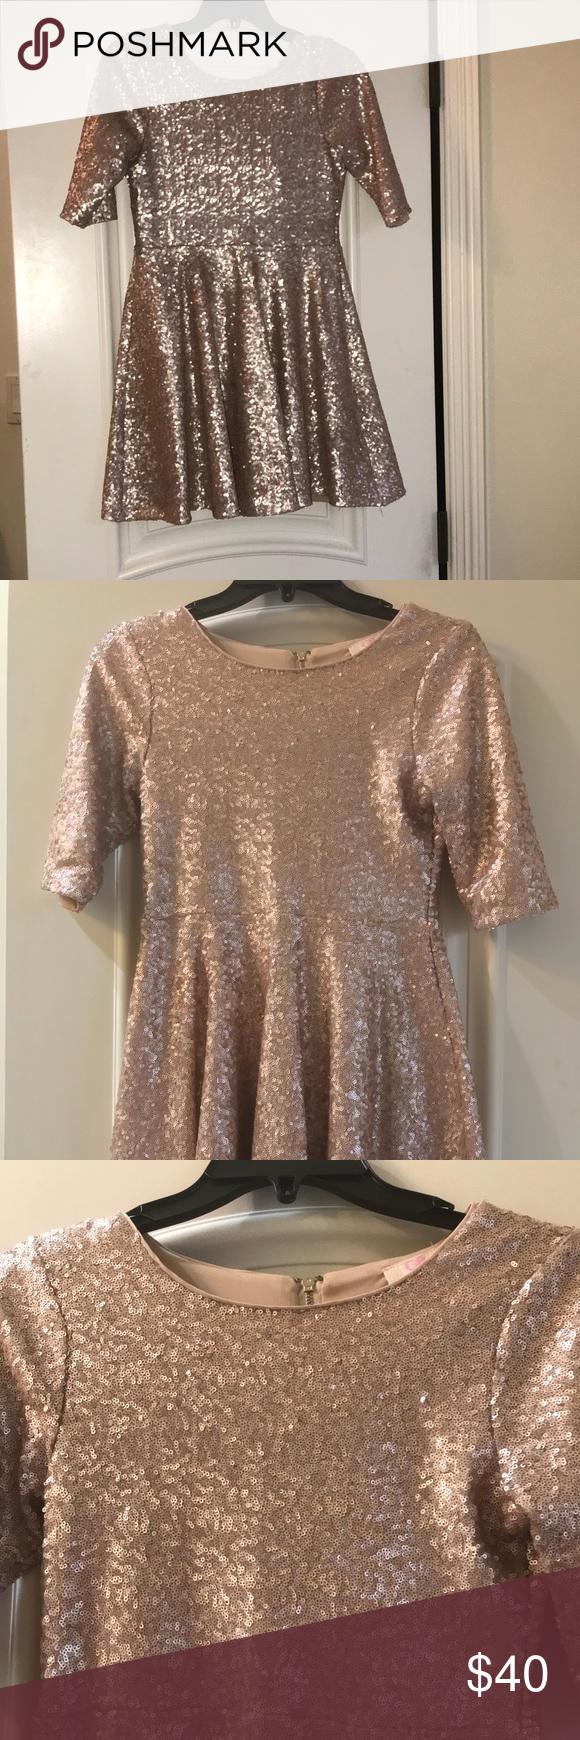 7b01a2fcf2 Gianni Bini Girl dress Beautiful and elegant sequin rose gold dress. Used  once